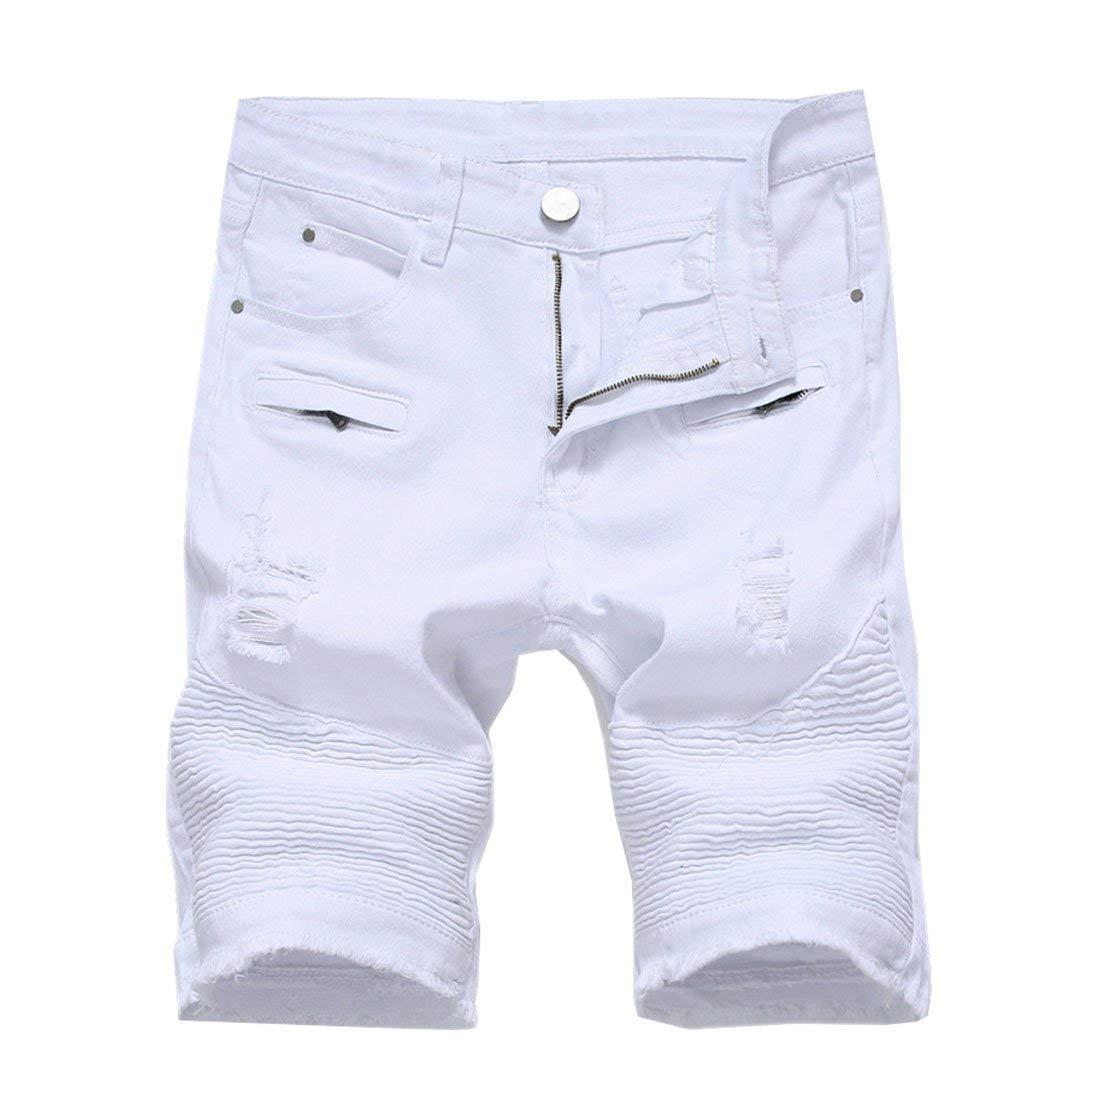 Hzcx Fashion Men's Midrise Elastic Wrinkle Ripped Straight Fit Denim Shorts